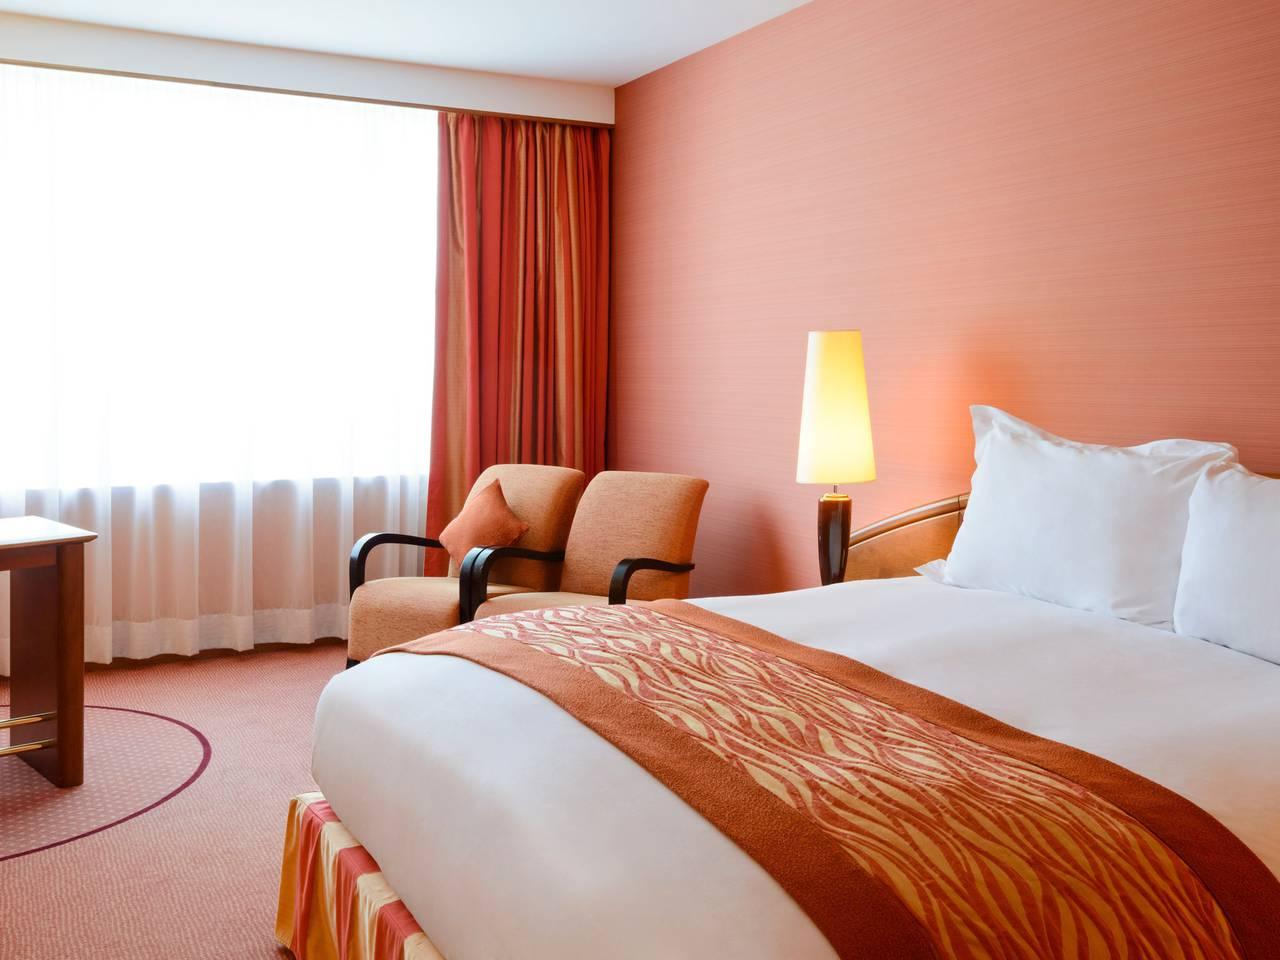 Sofitel Hotel Luxembourg Europe 5 Sterne Luxushotels